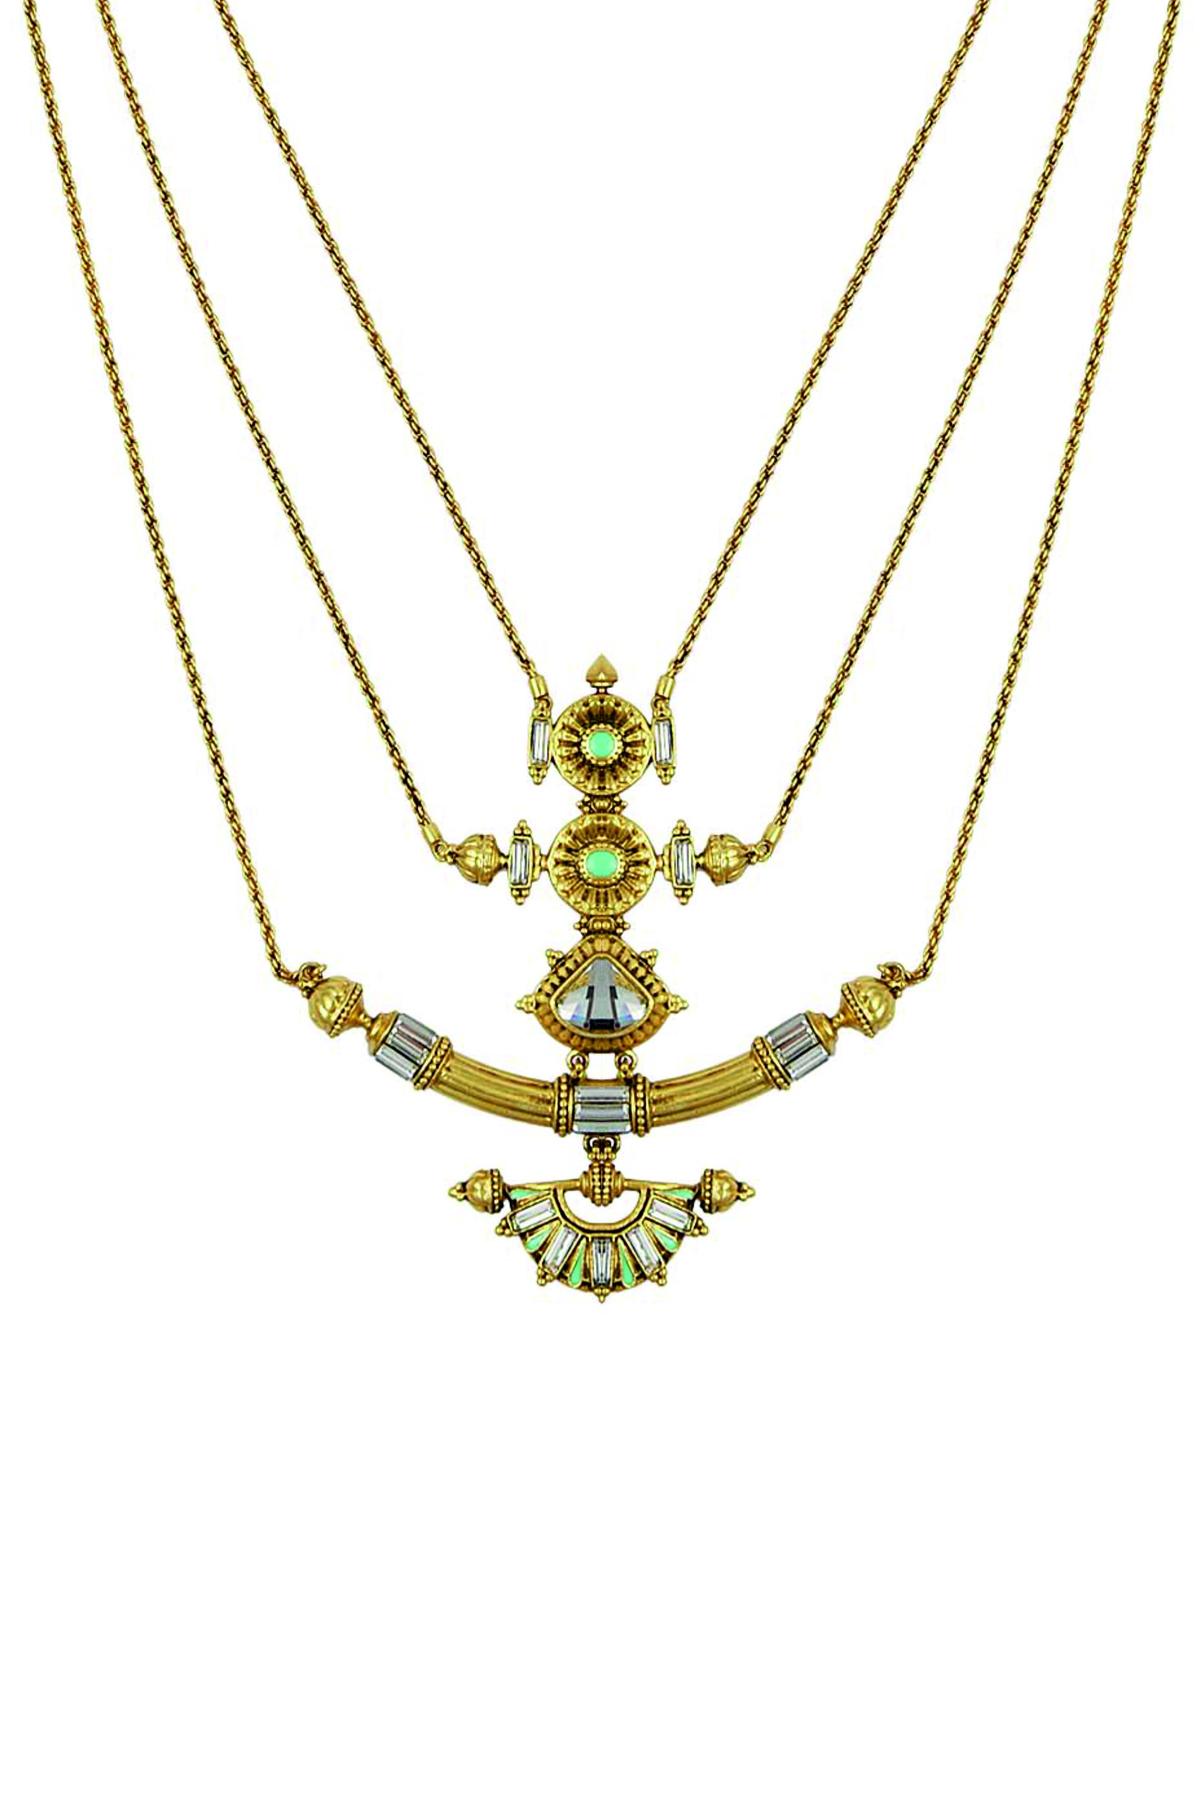 Baroque Trident Necklace